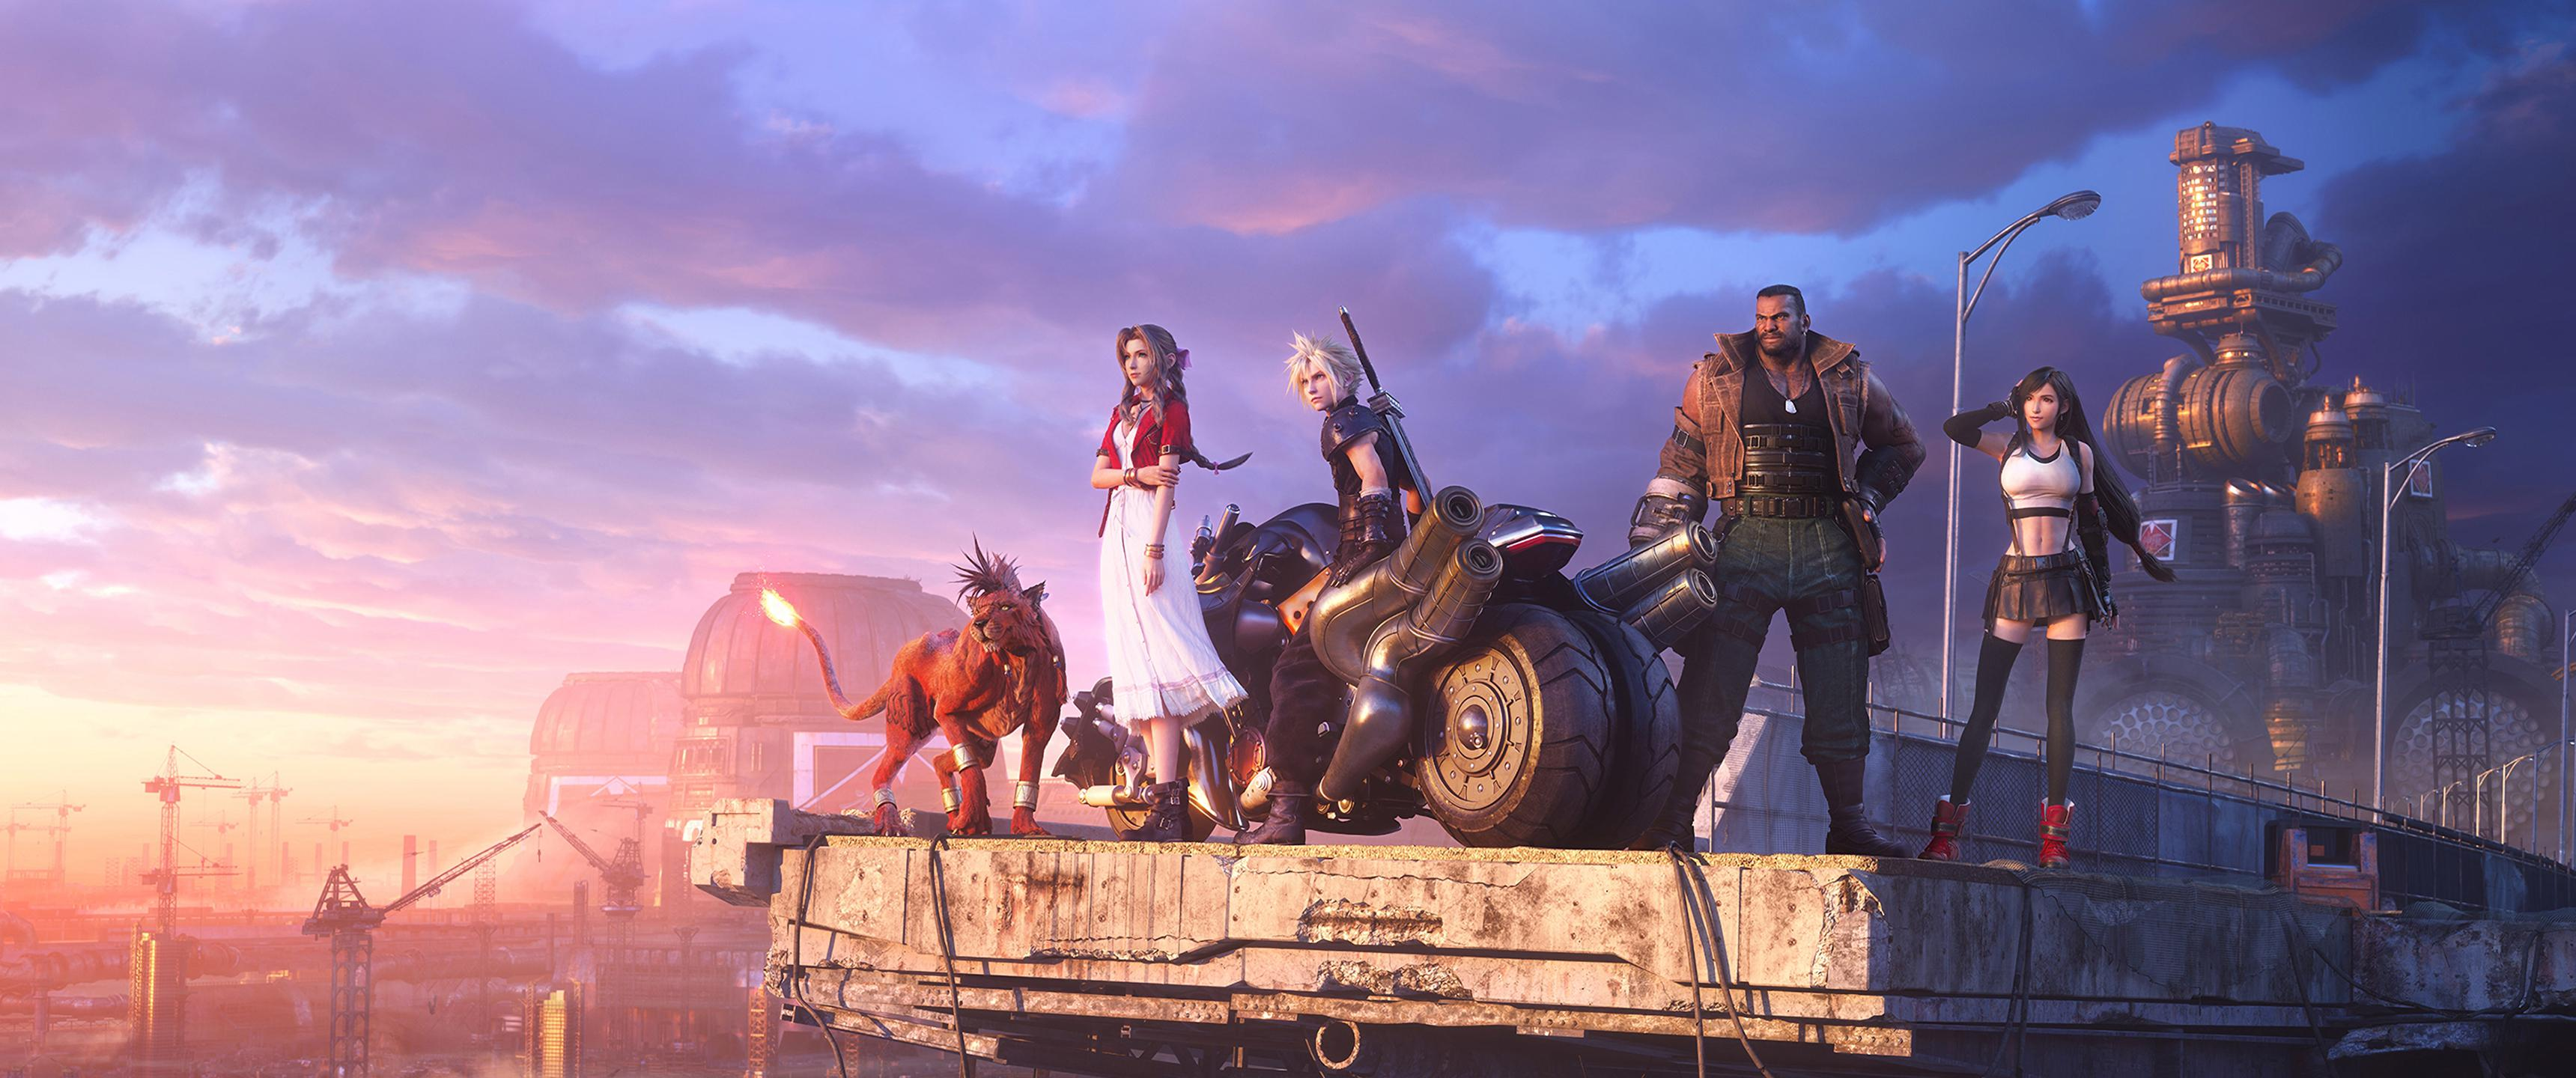 Final Fantasy Vii Remake Hd Wallpaper